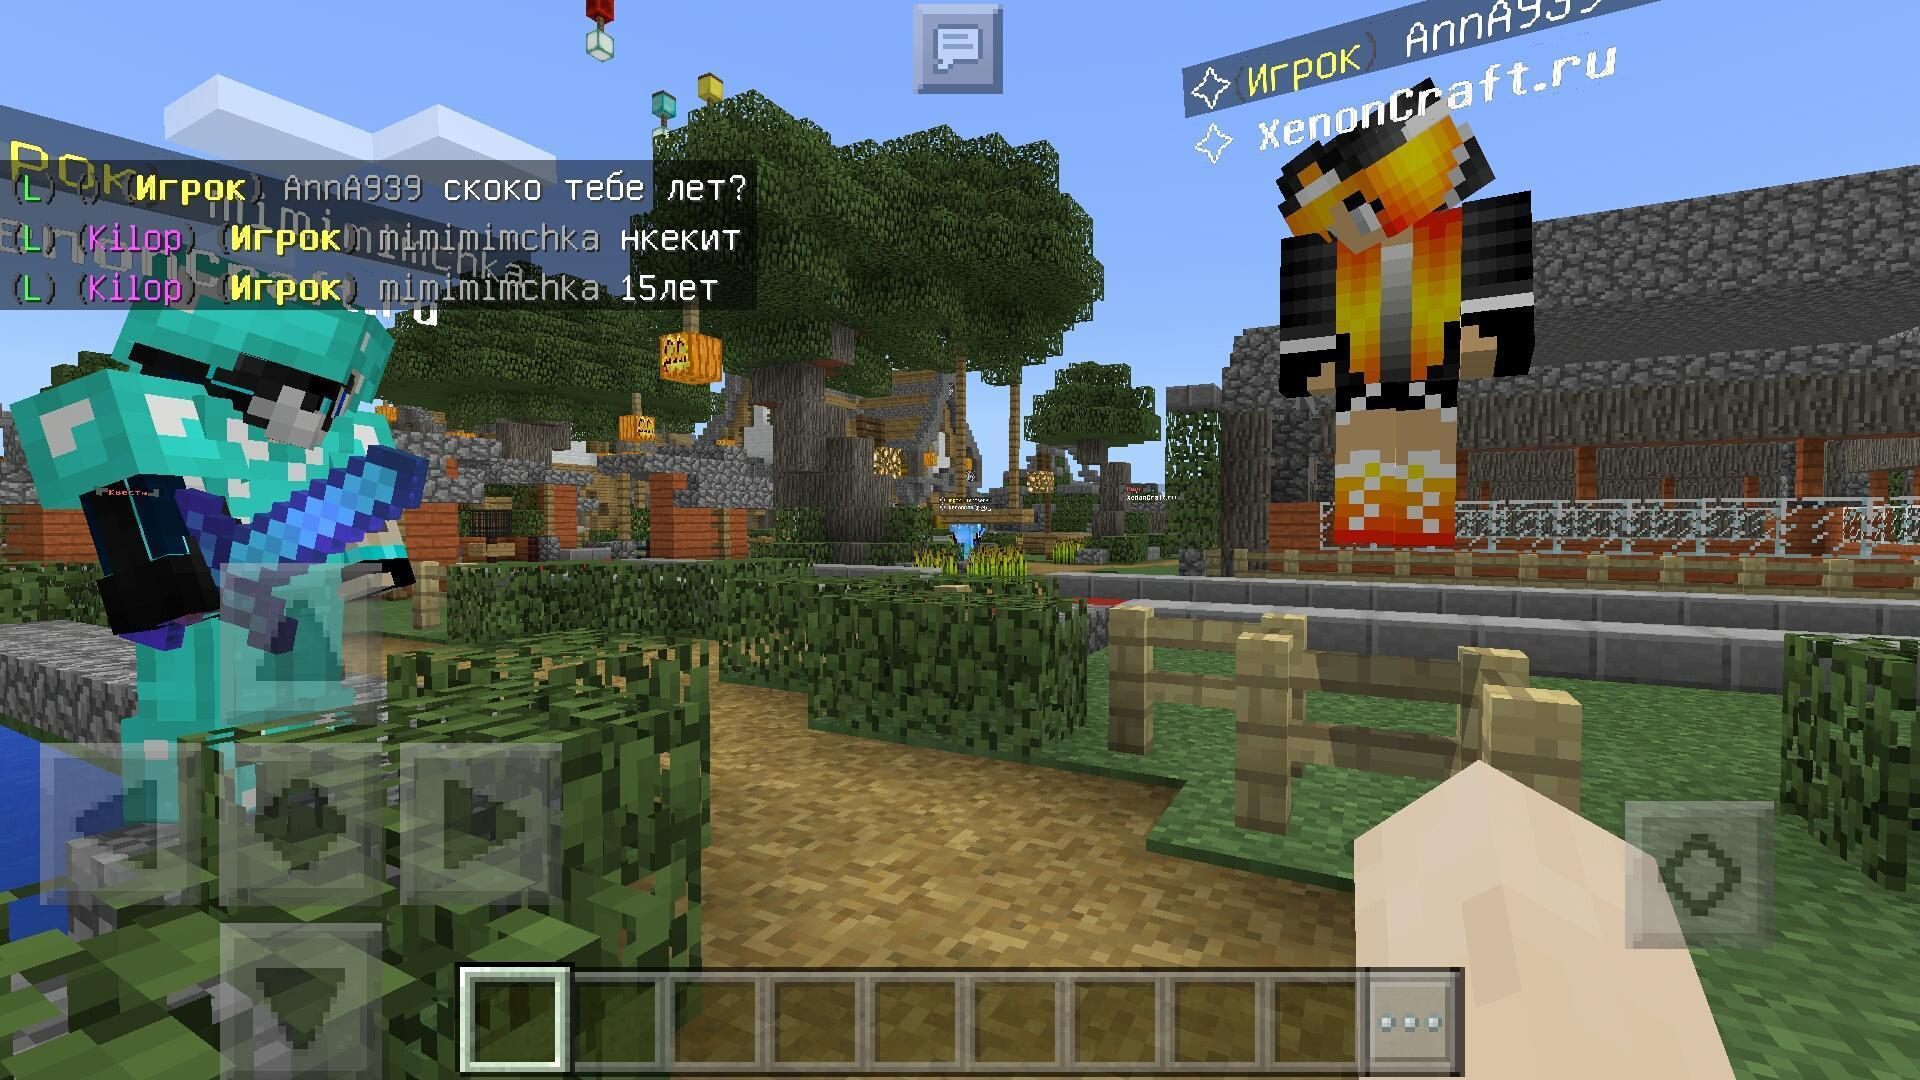 Tentang-Minecraft-PE-Versi-Terbaru